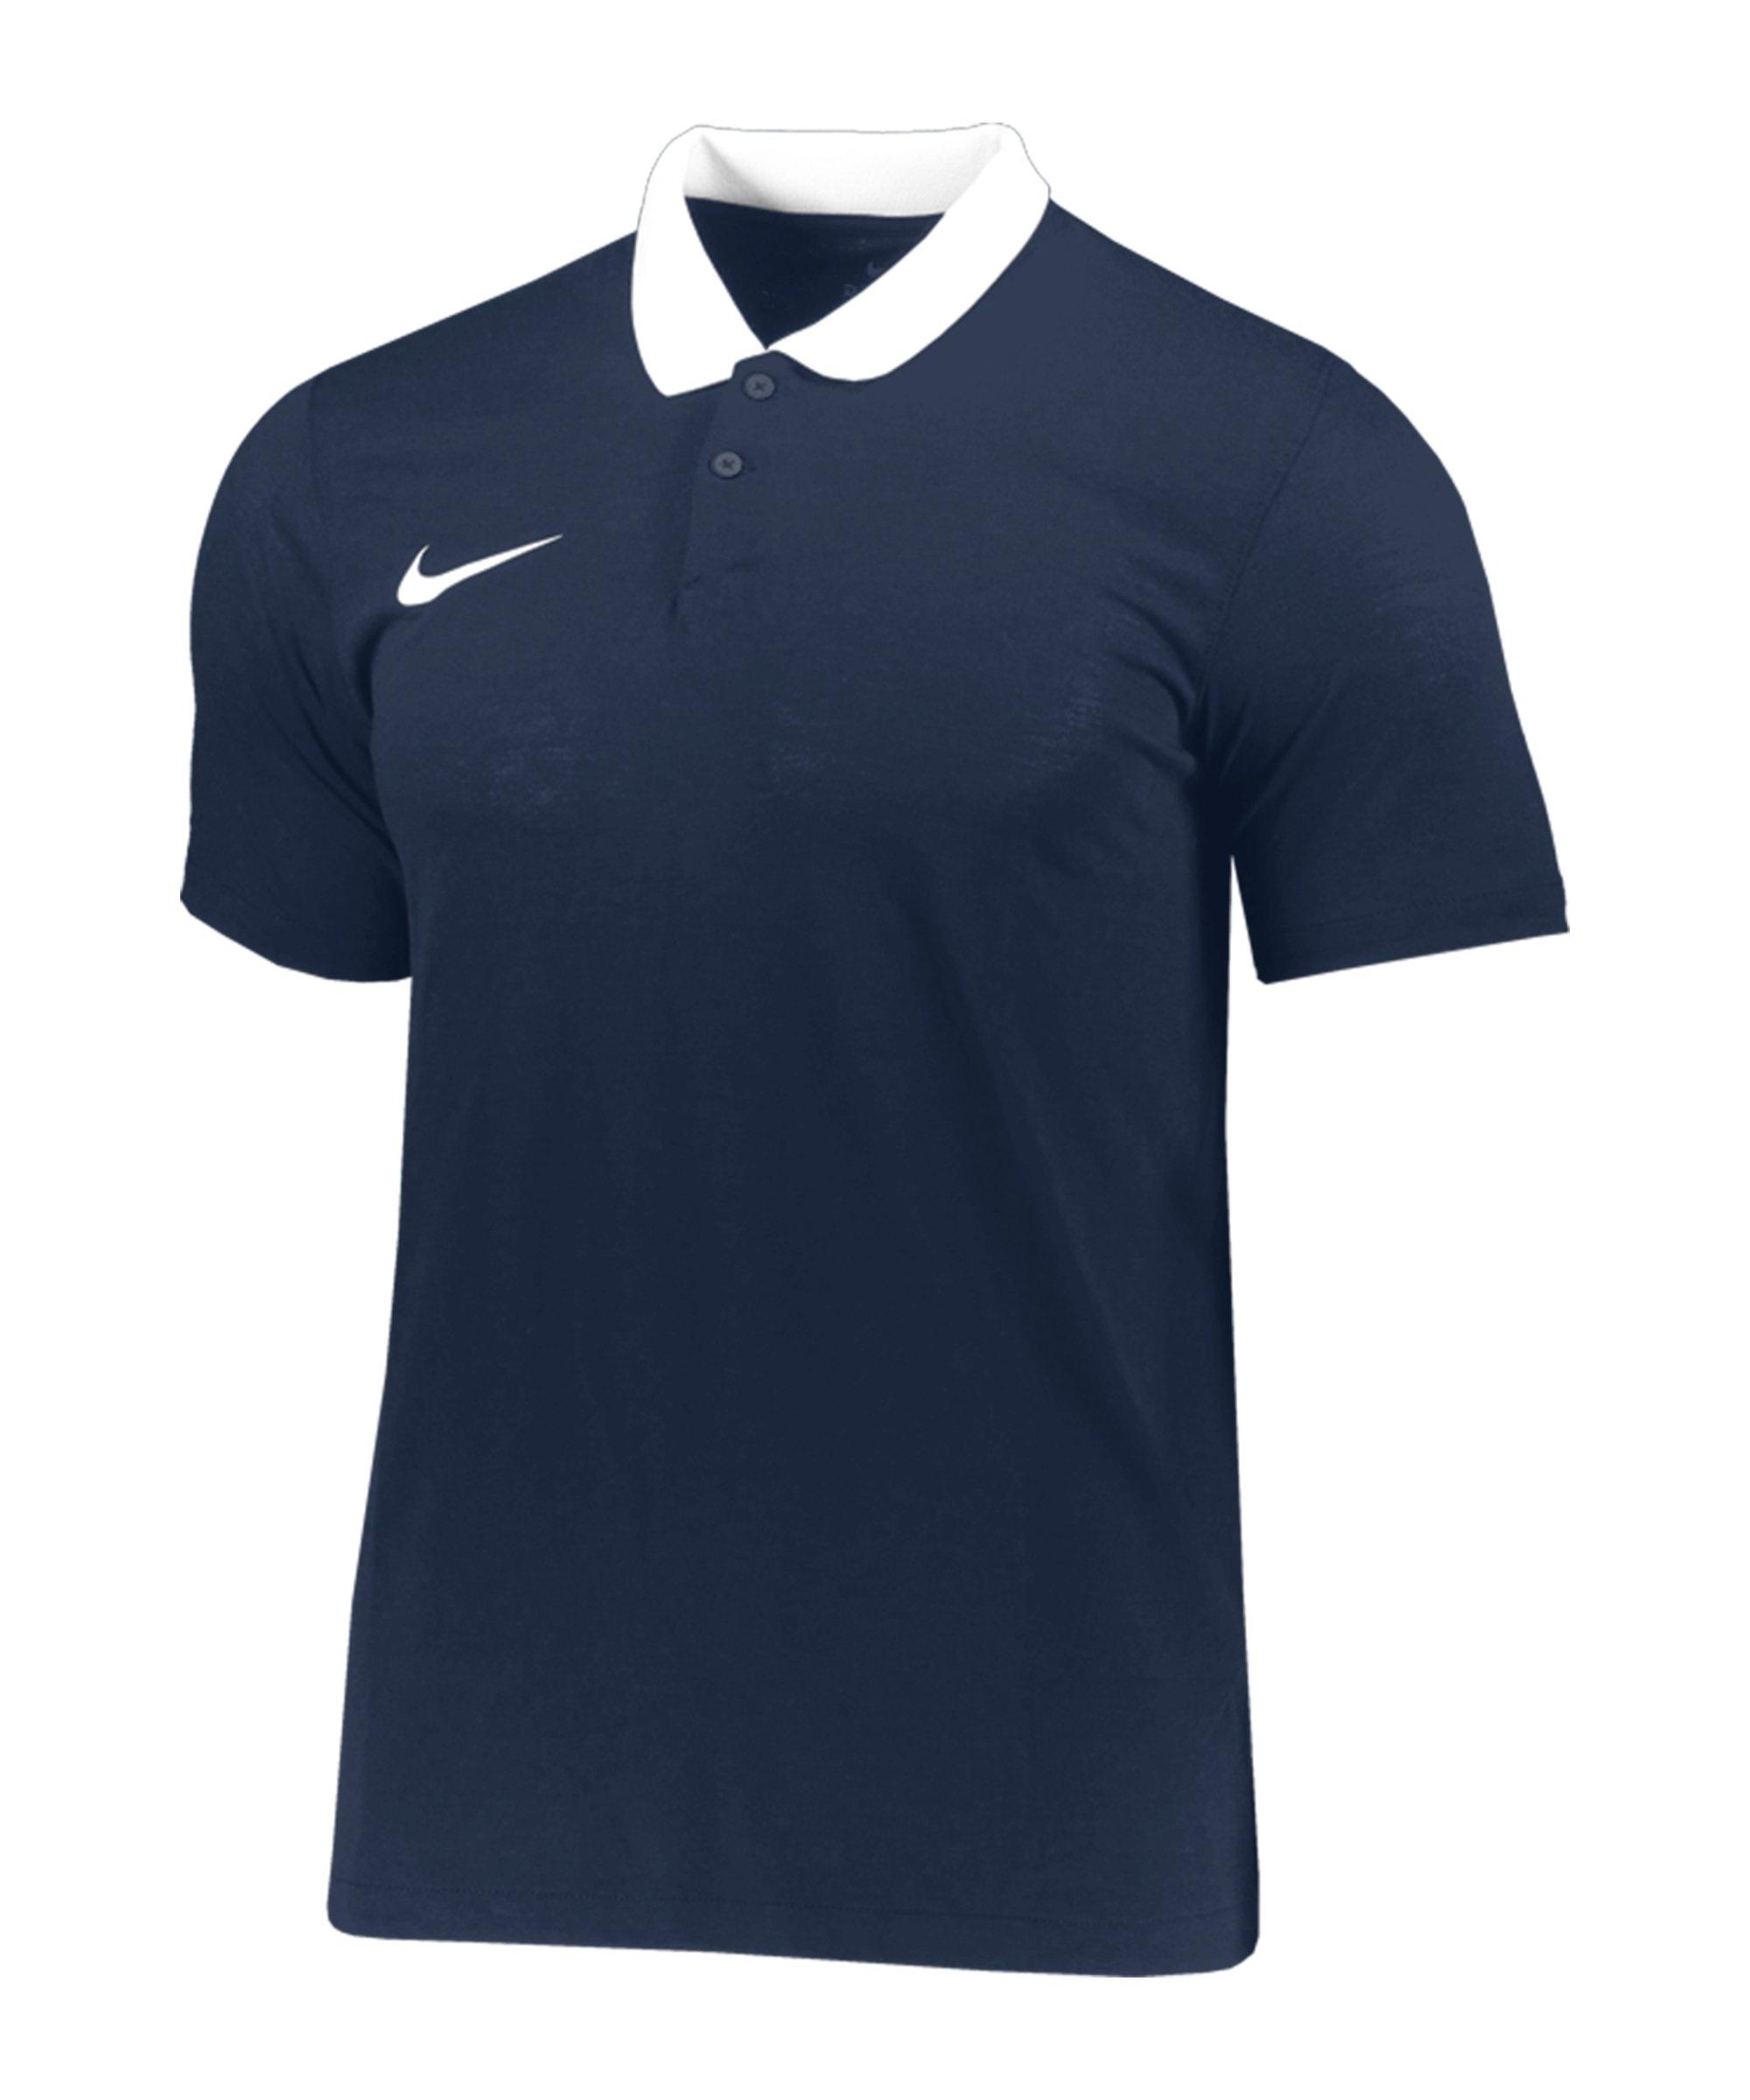 Nike Park 20 Poloshirt Blau Weiss F451 - blau